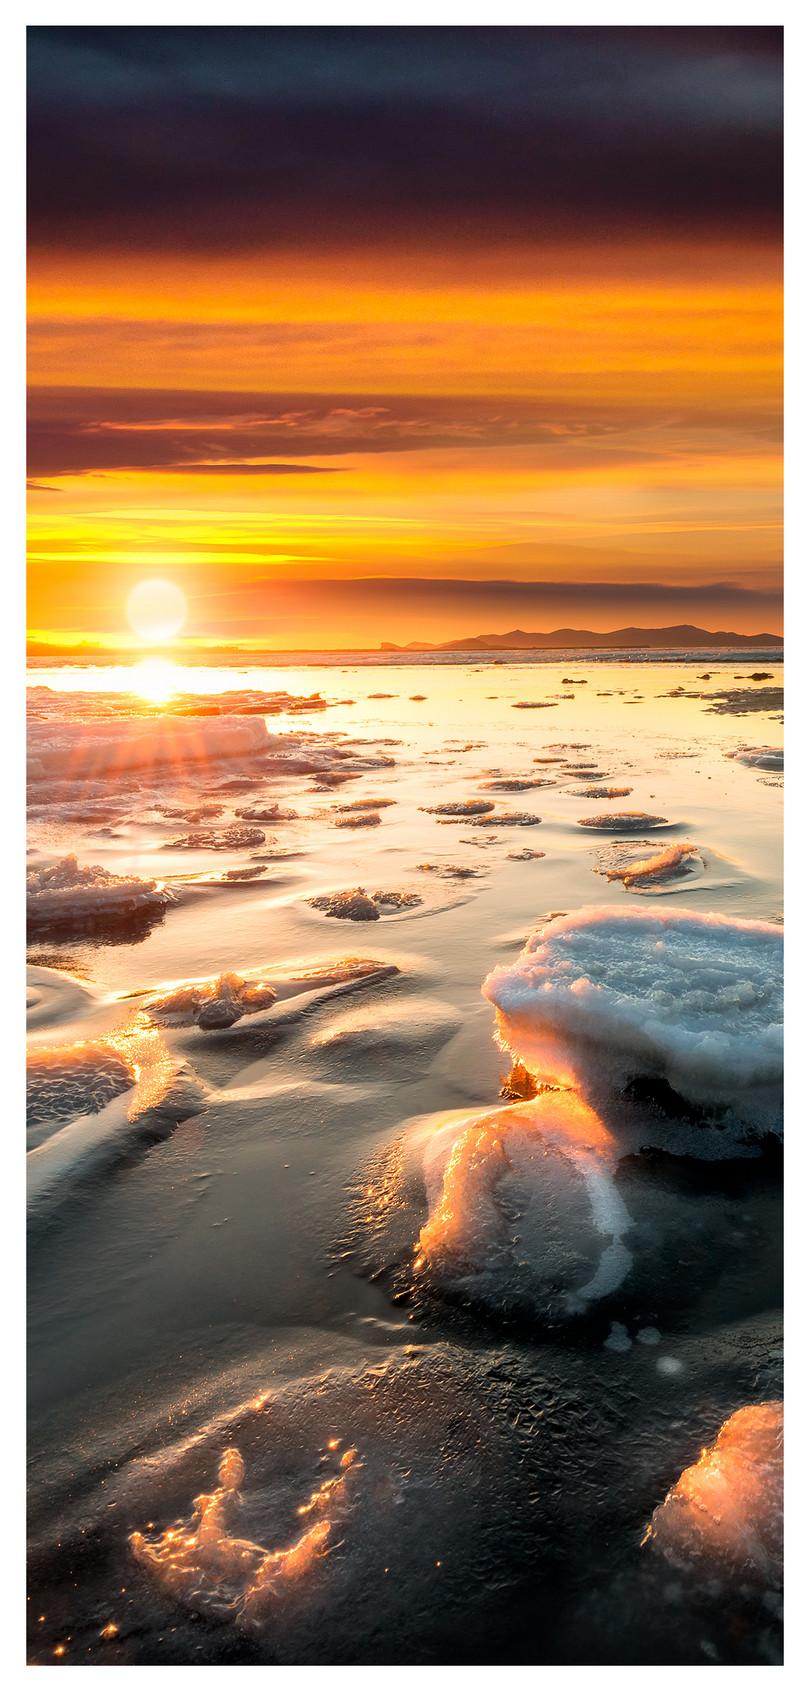 Sea Ice Scenery Mobile Phone Wallpaper In The Setting Sun